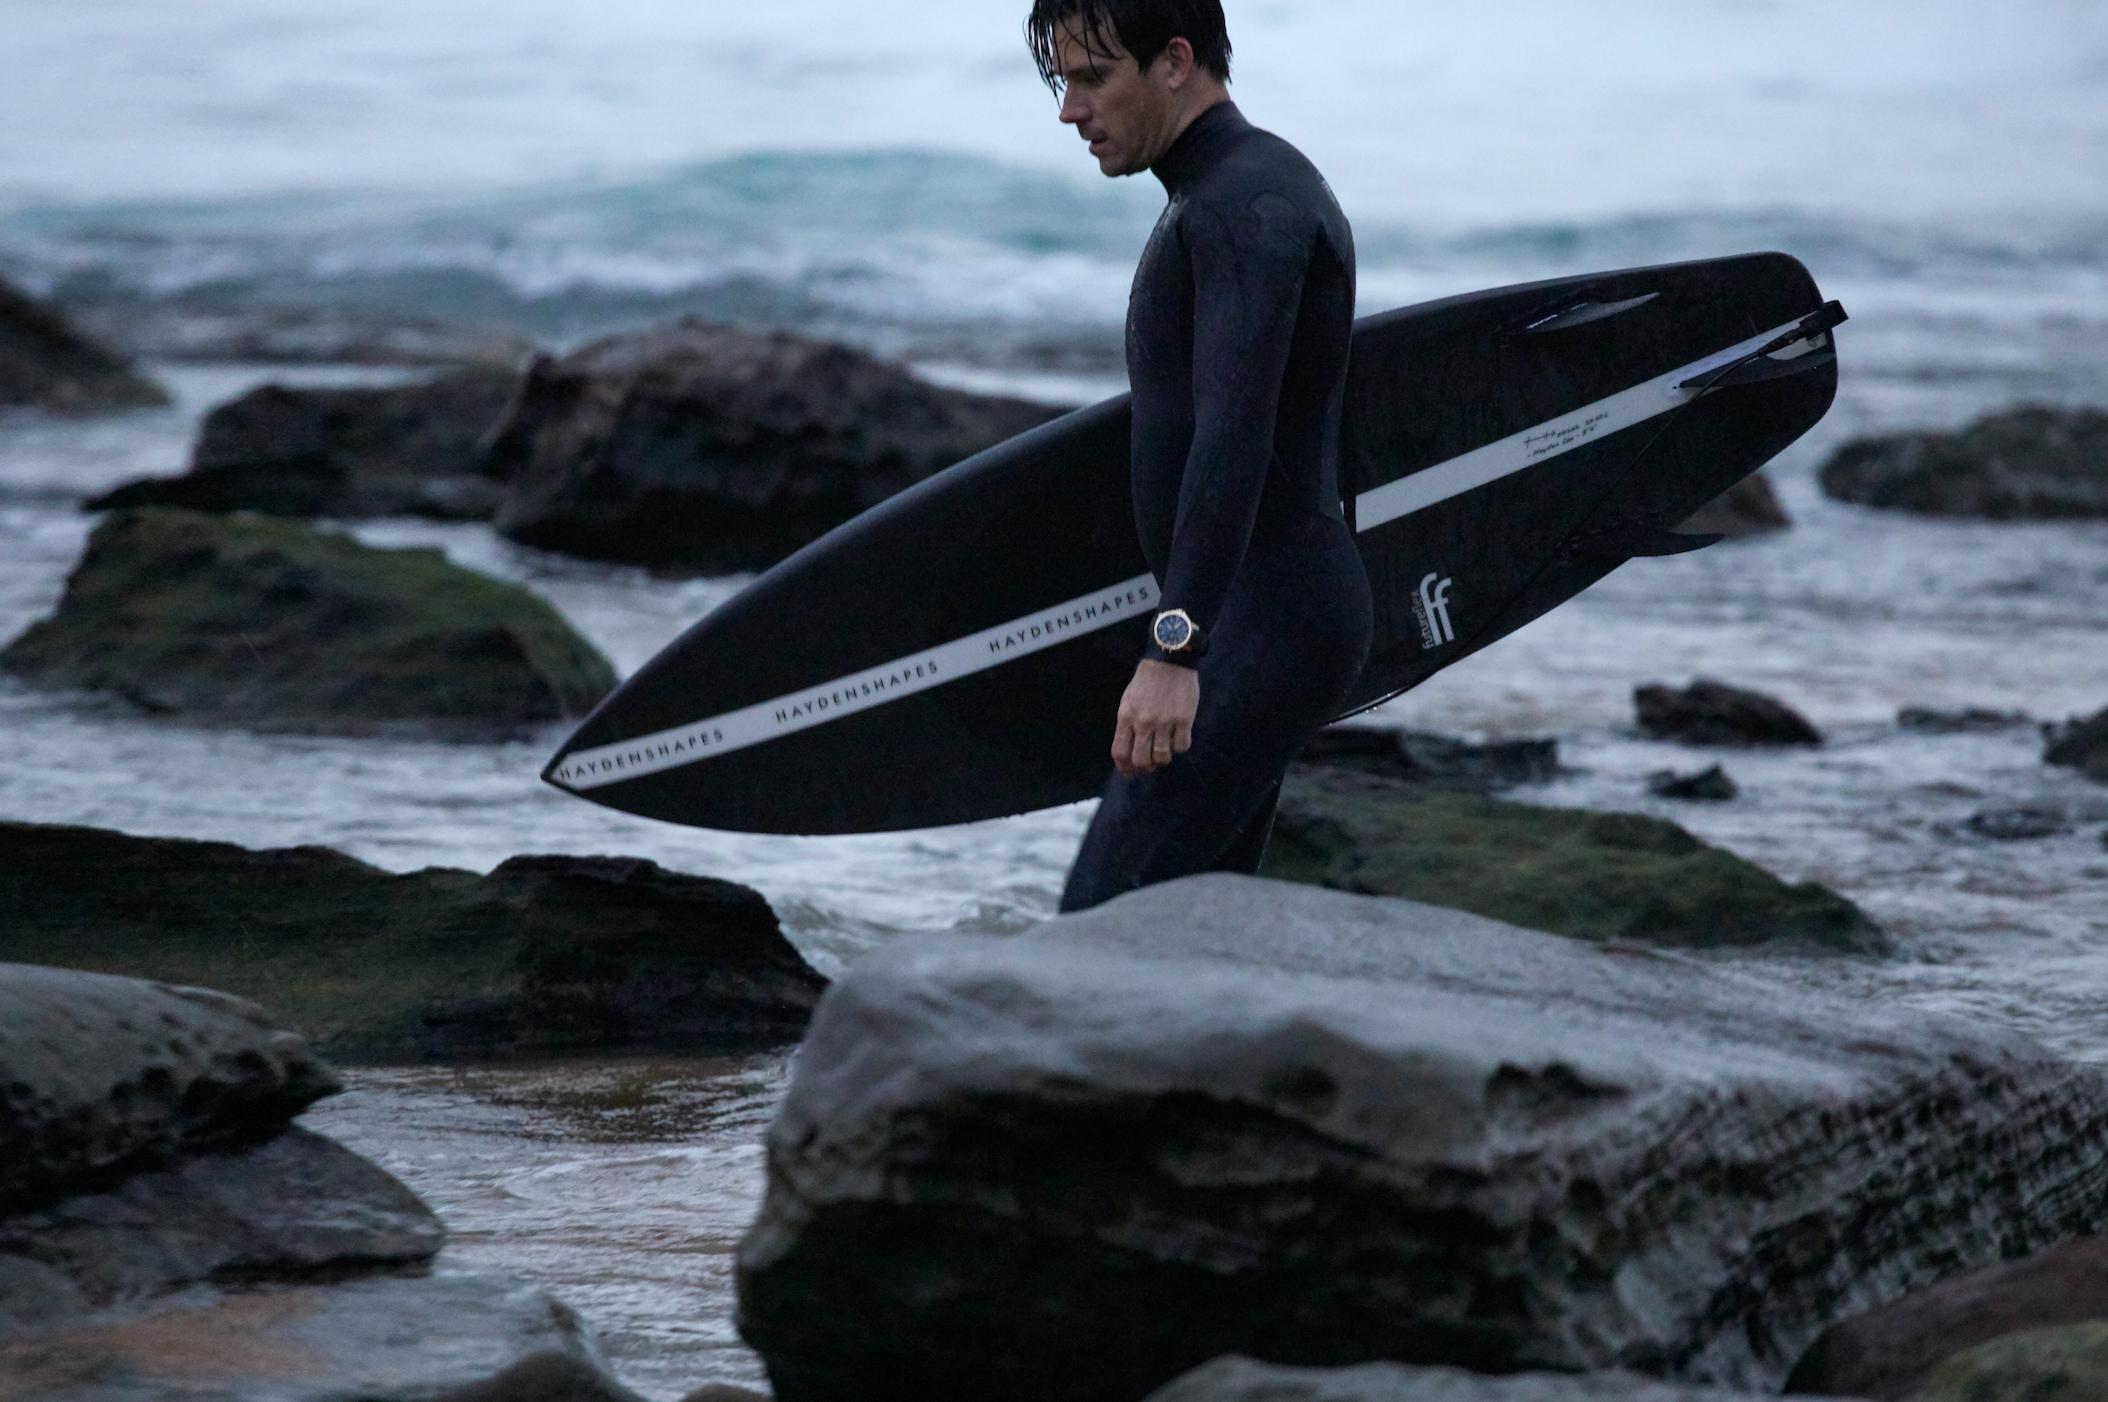 Australian Surfboard Maker Reveals Awkward Truth About Surfing's 'Eco Warriors'